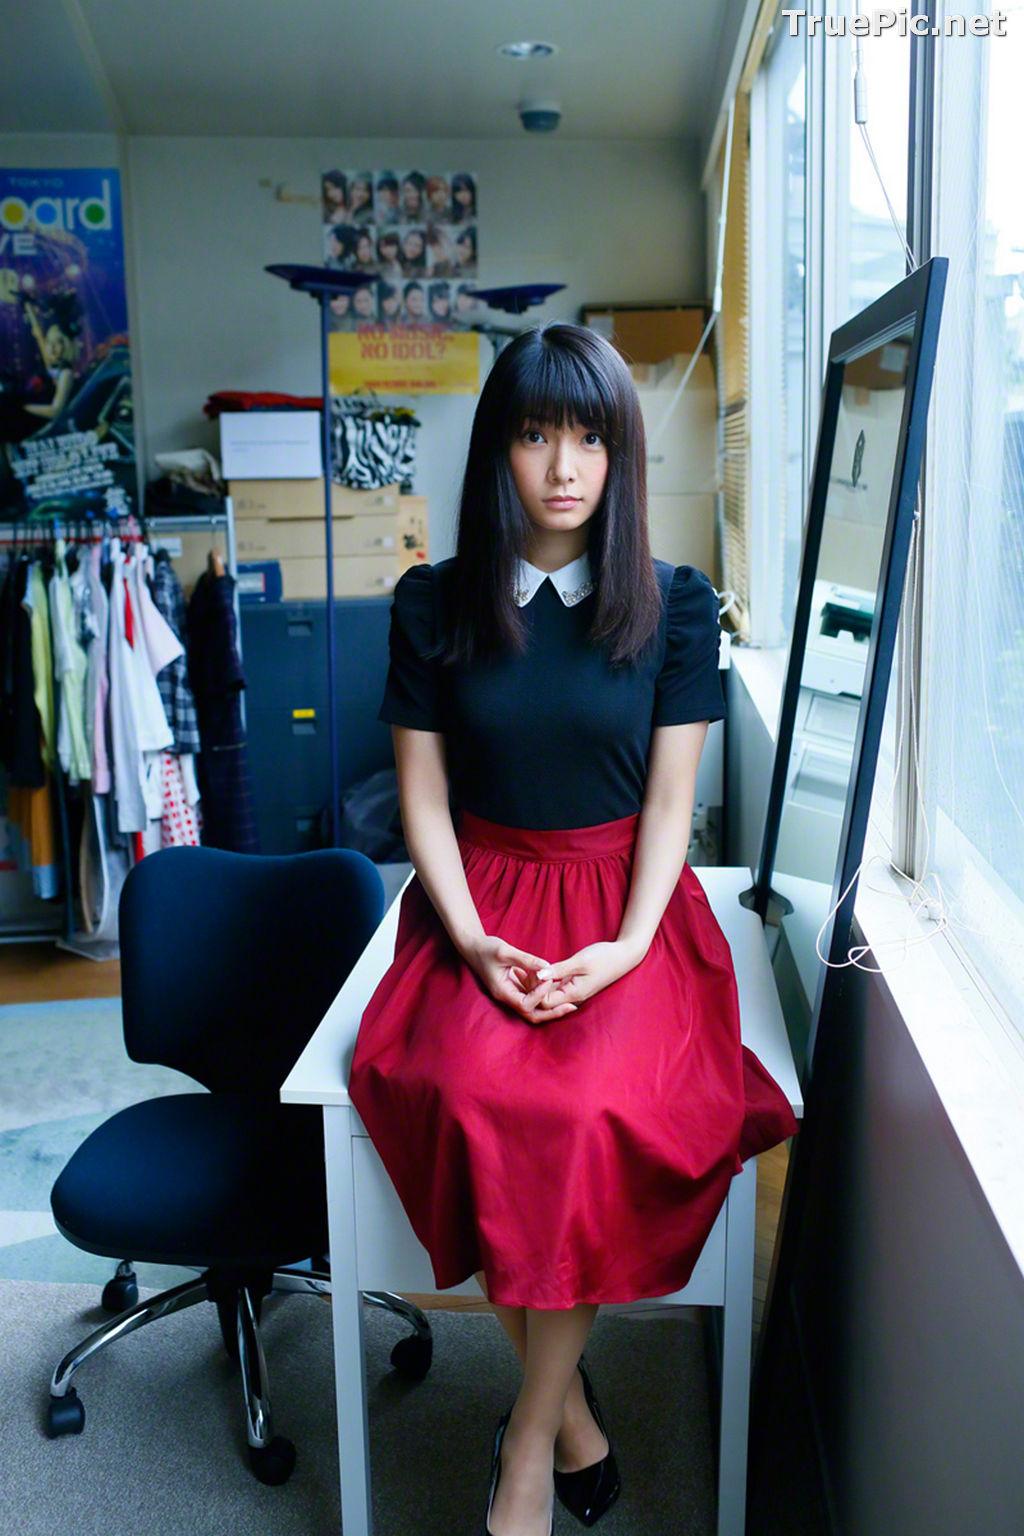 Image Wanibooks No.137 – Japanese Idol Singer and Actress – Erika Tonooka - TruePic.net - Picture-1